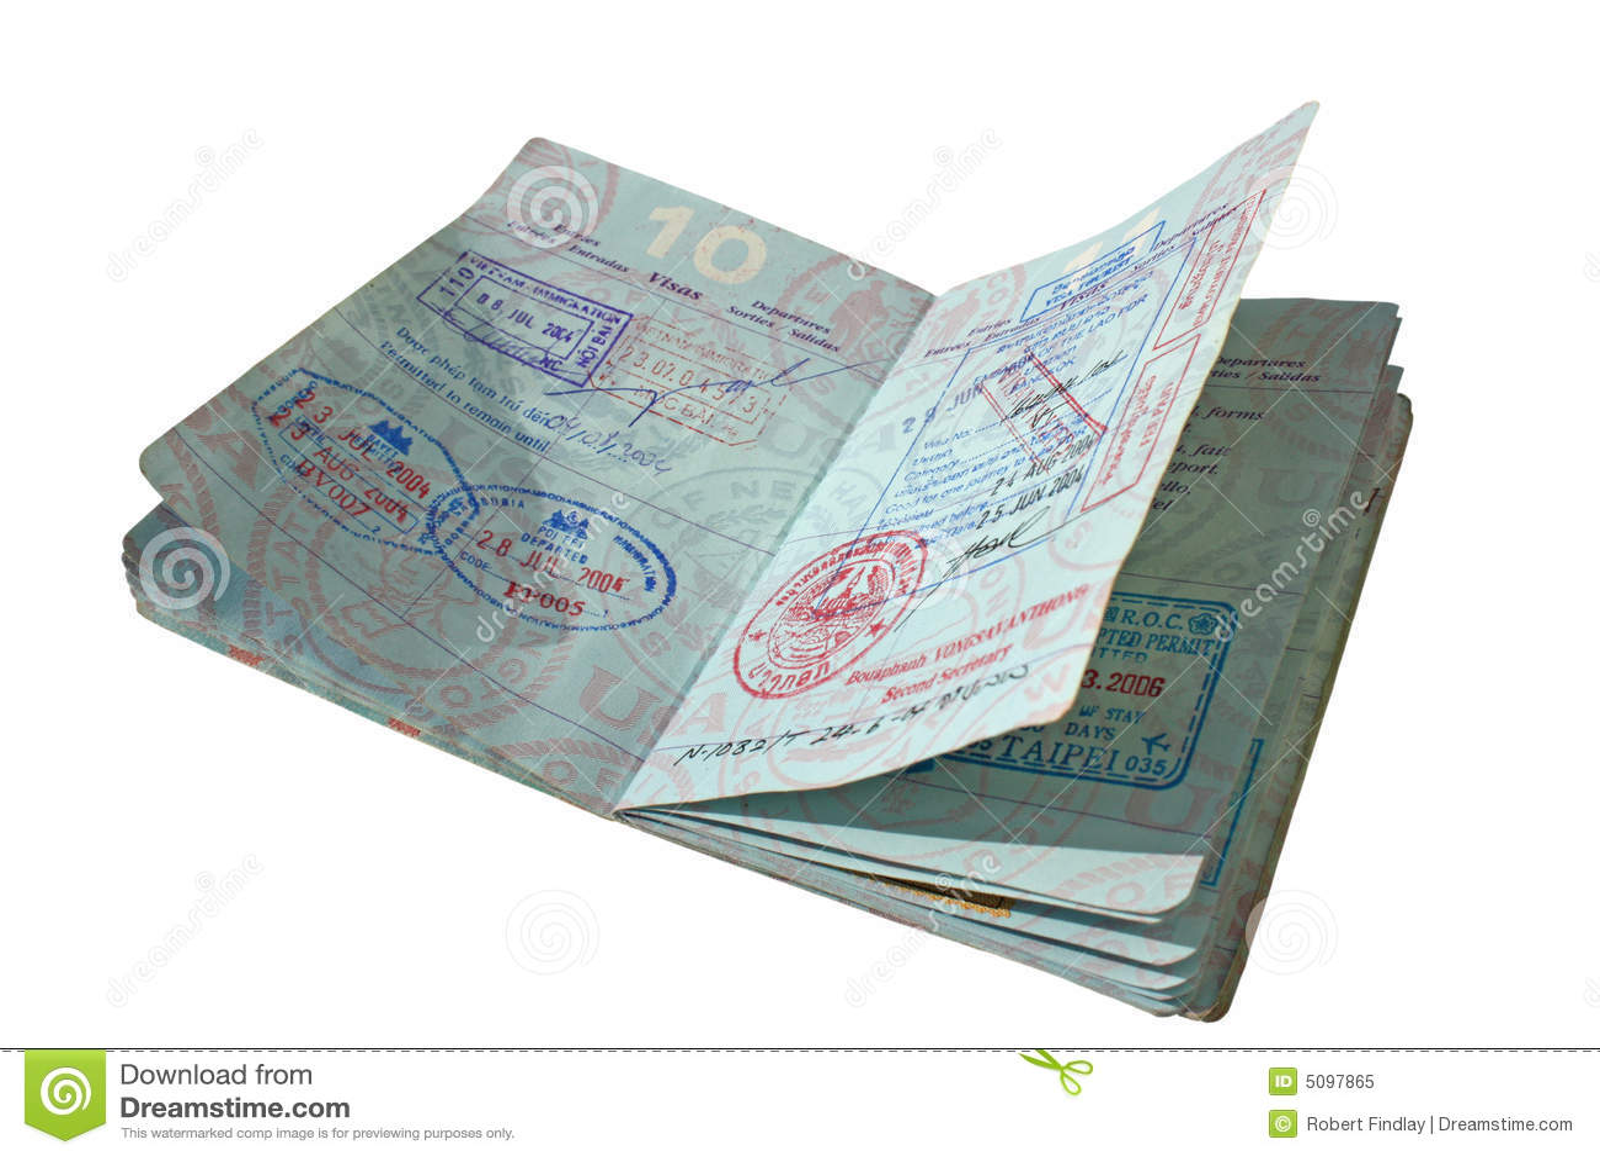 Russian Visa Edinburgh Consulate